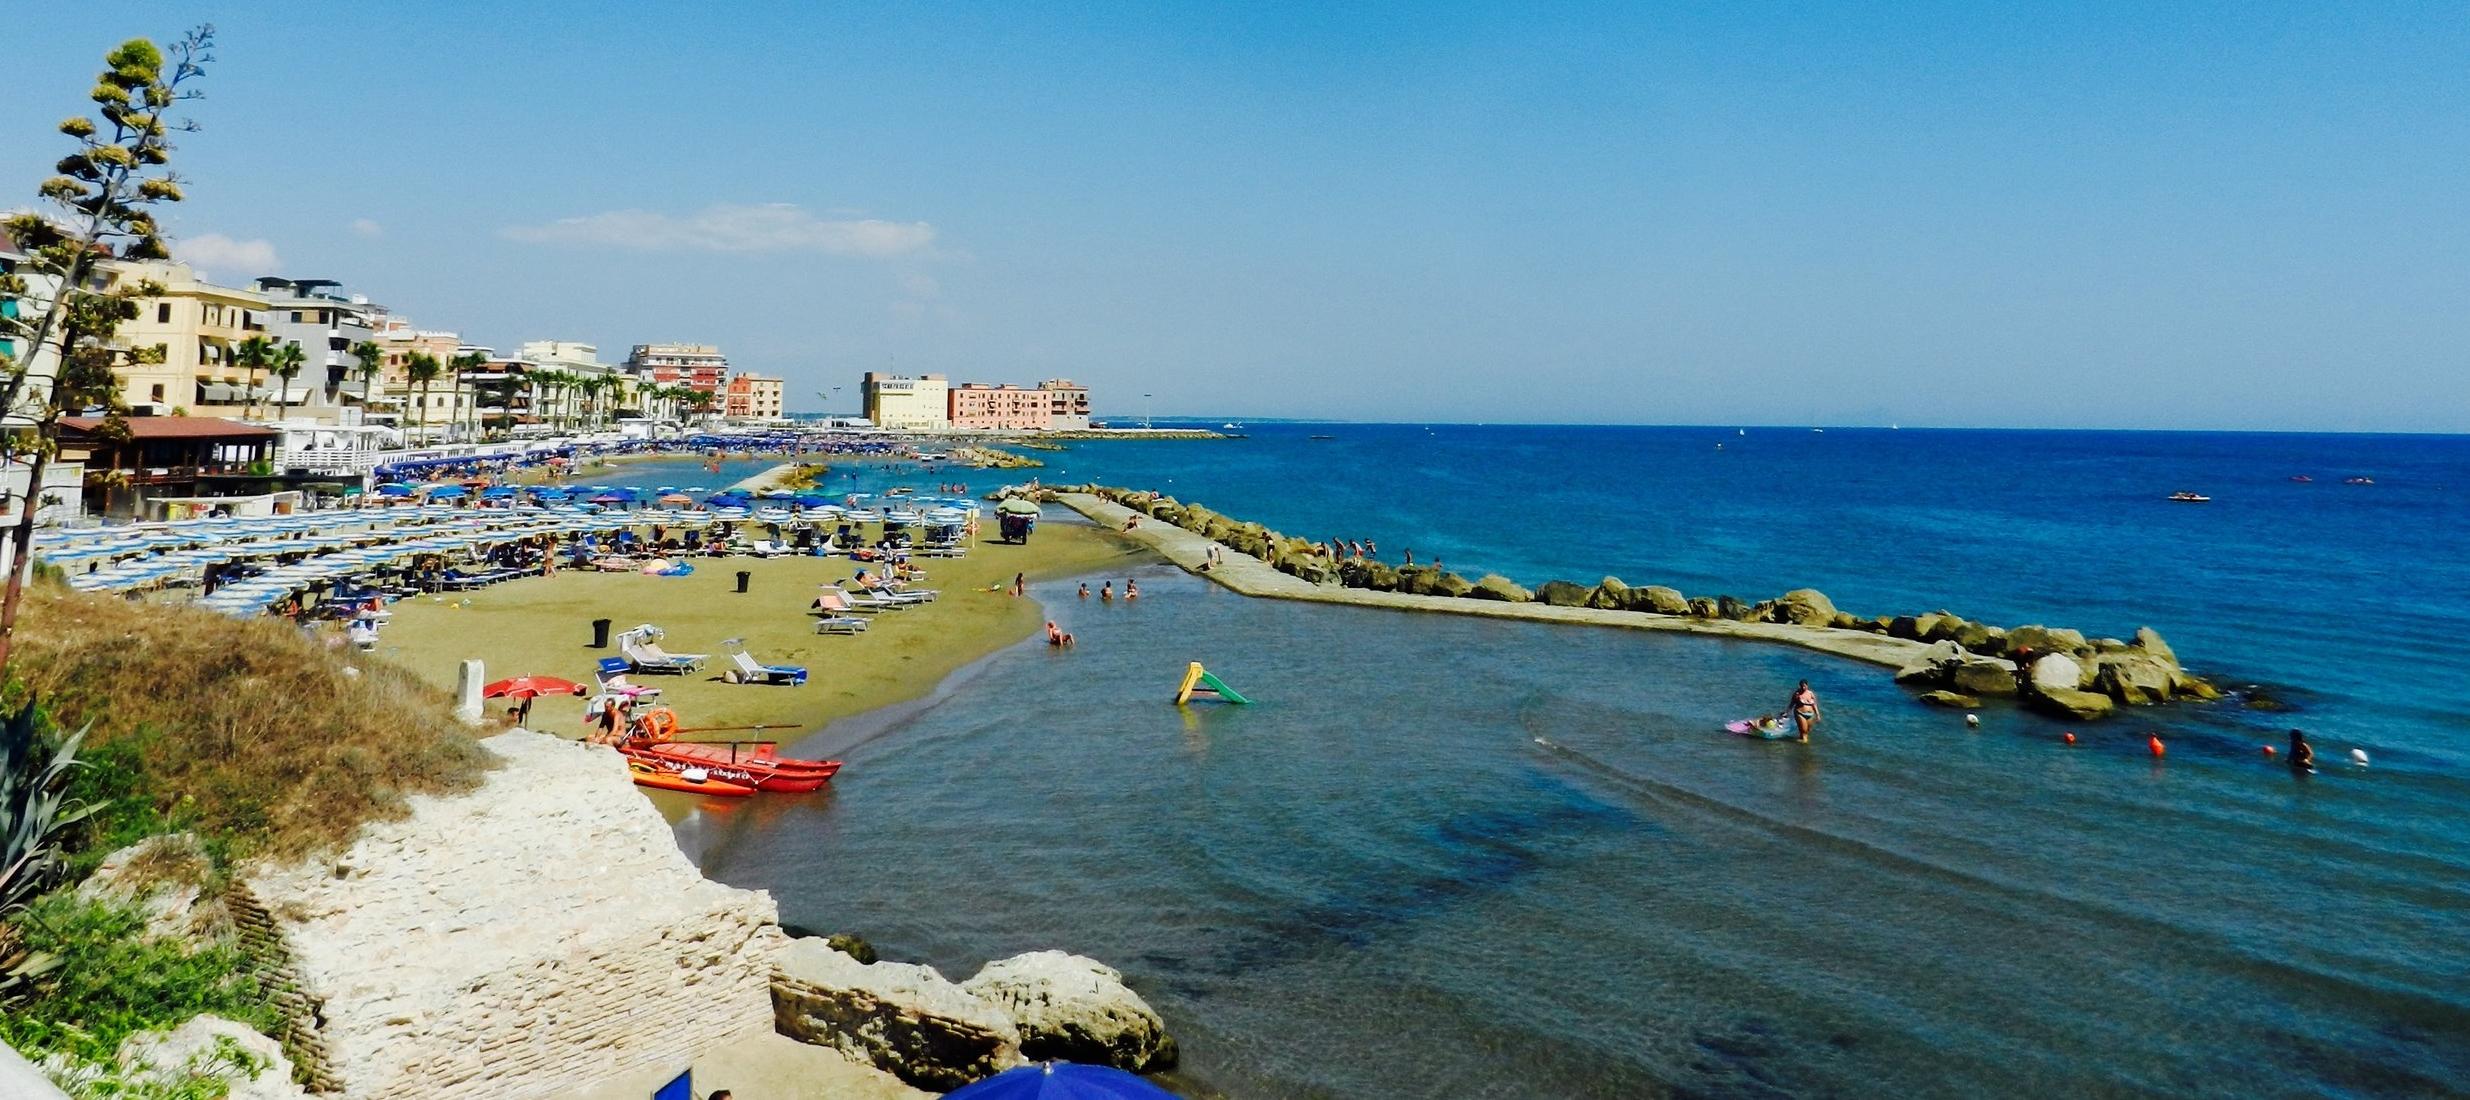 Anzio shoreline. Photo by Britnae Purdy